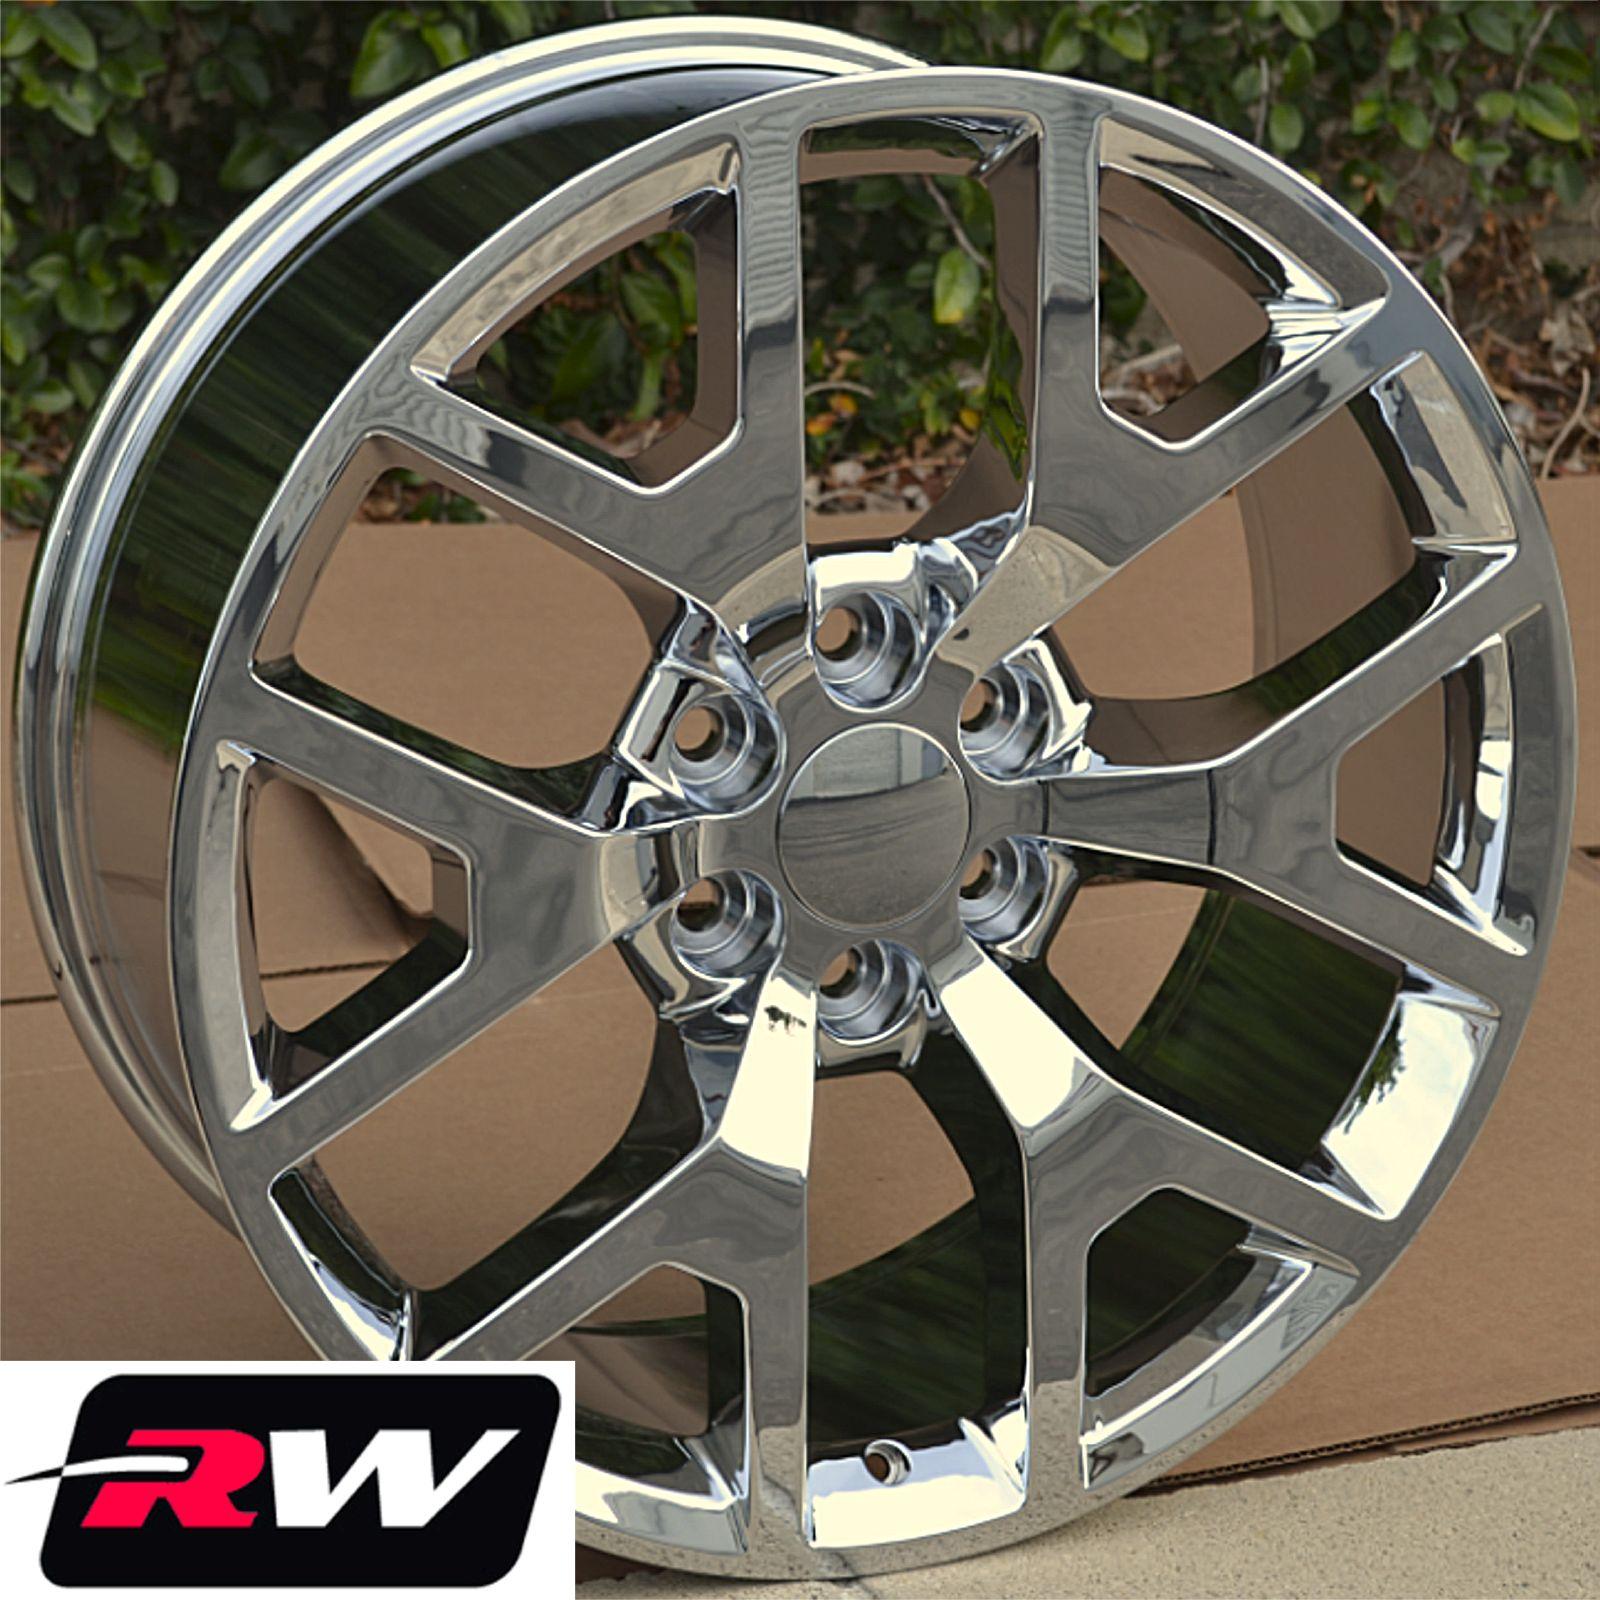 50 Inch Rims On Chevy : Gmc sierra wheels tires chrome rims inch